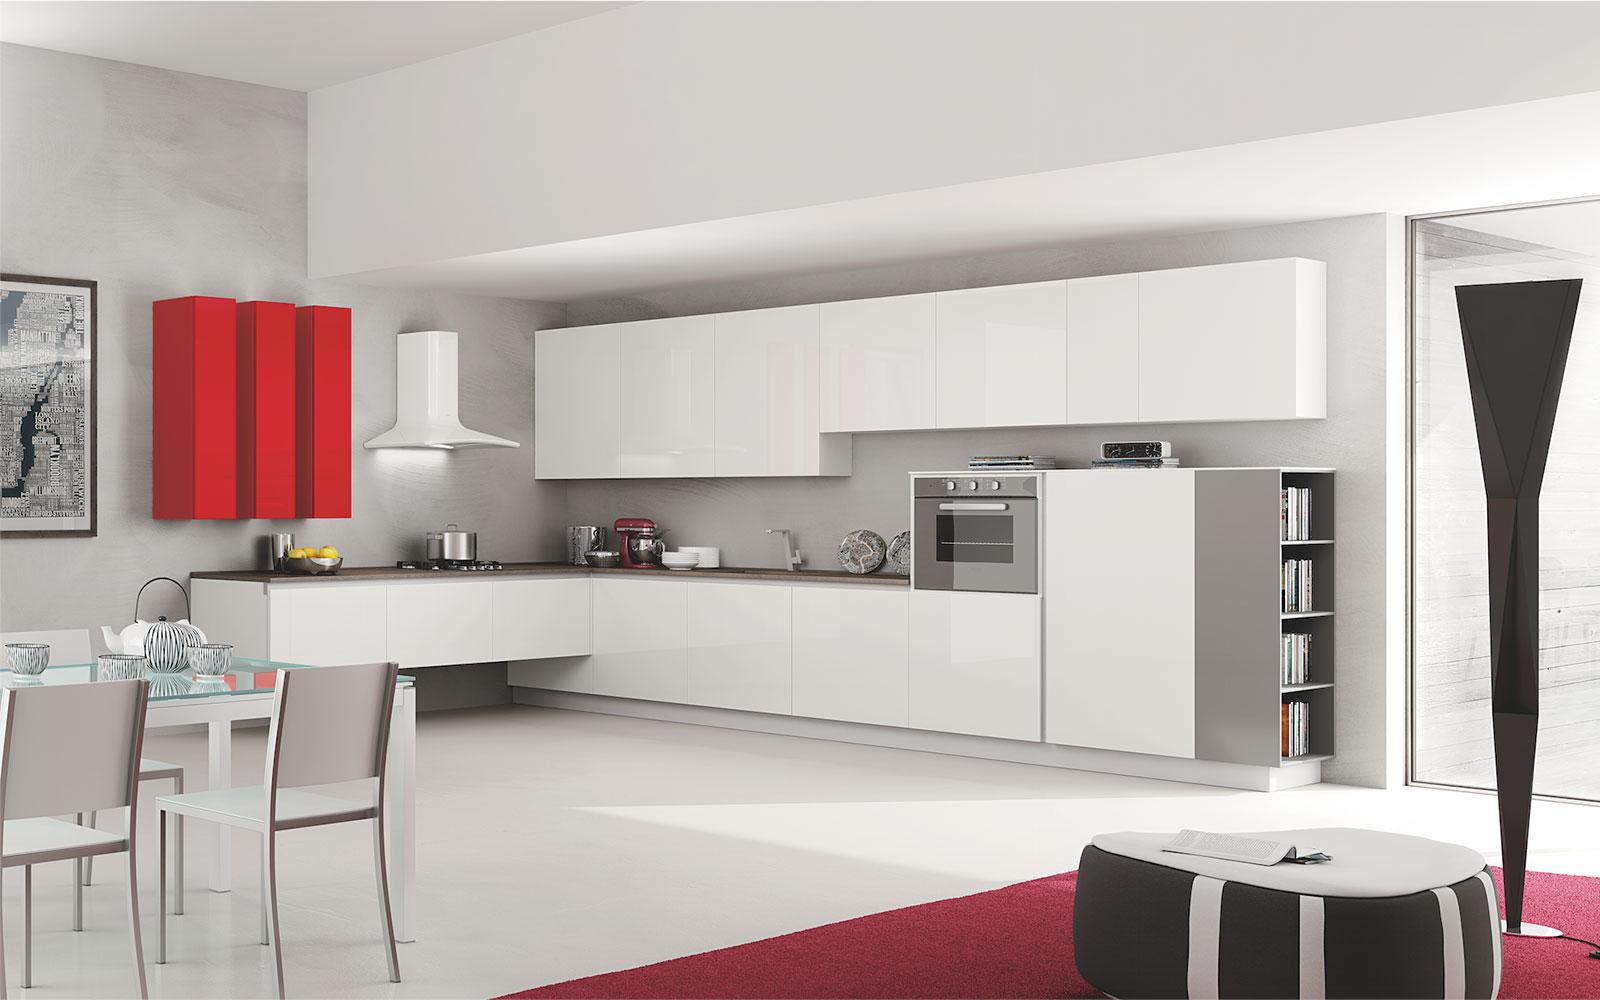 Stunning mobilturi cucine promozione ideas for Bea arredamenti